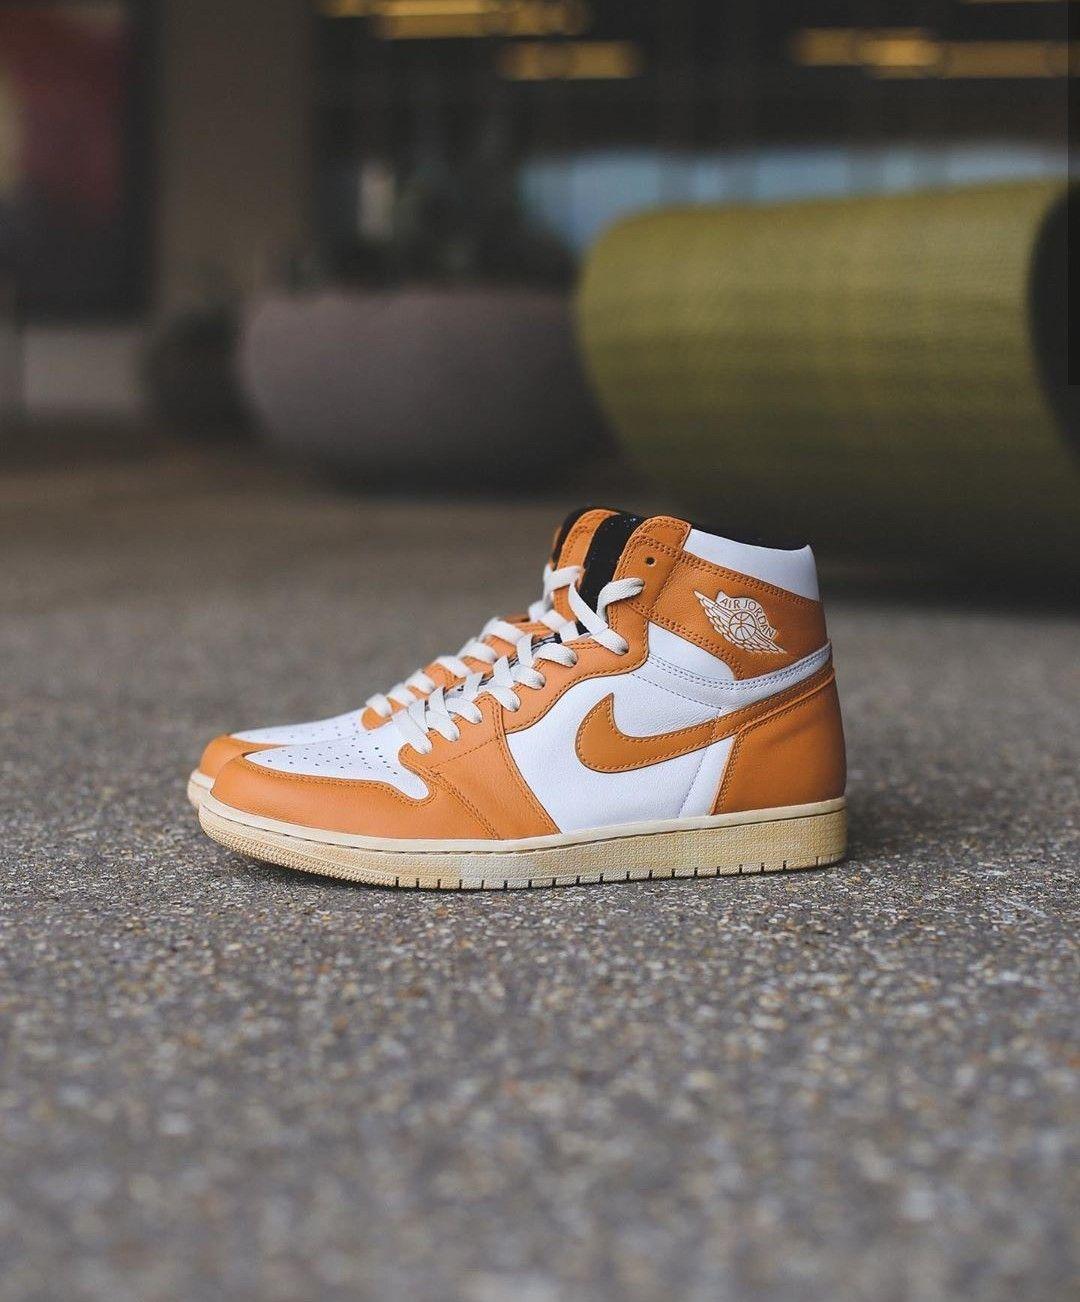 Popular sneakers, Sneakers, Air jordans